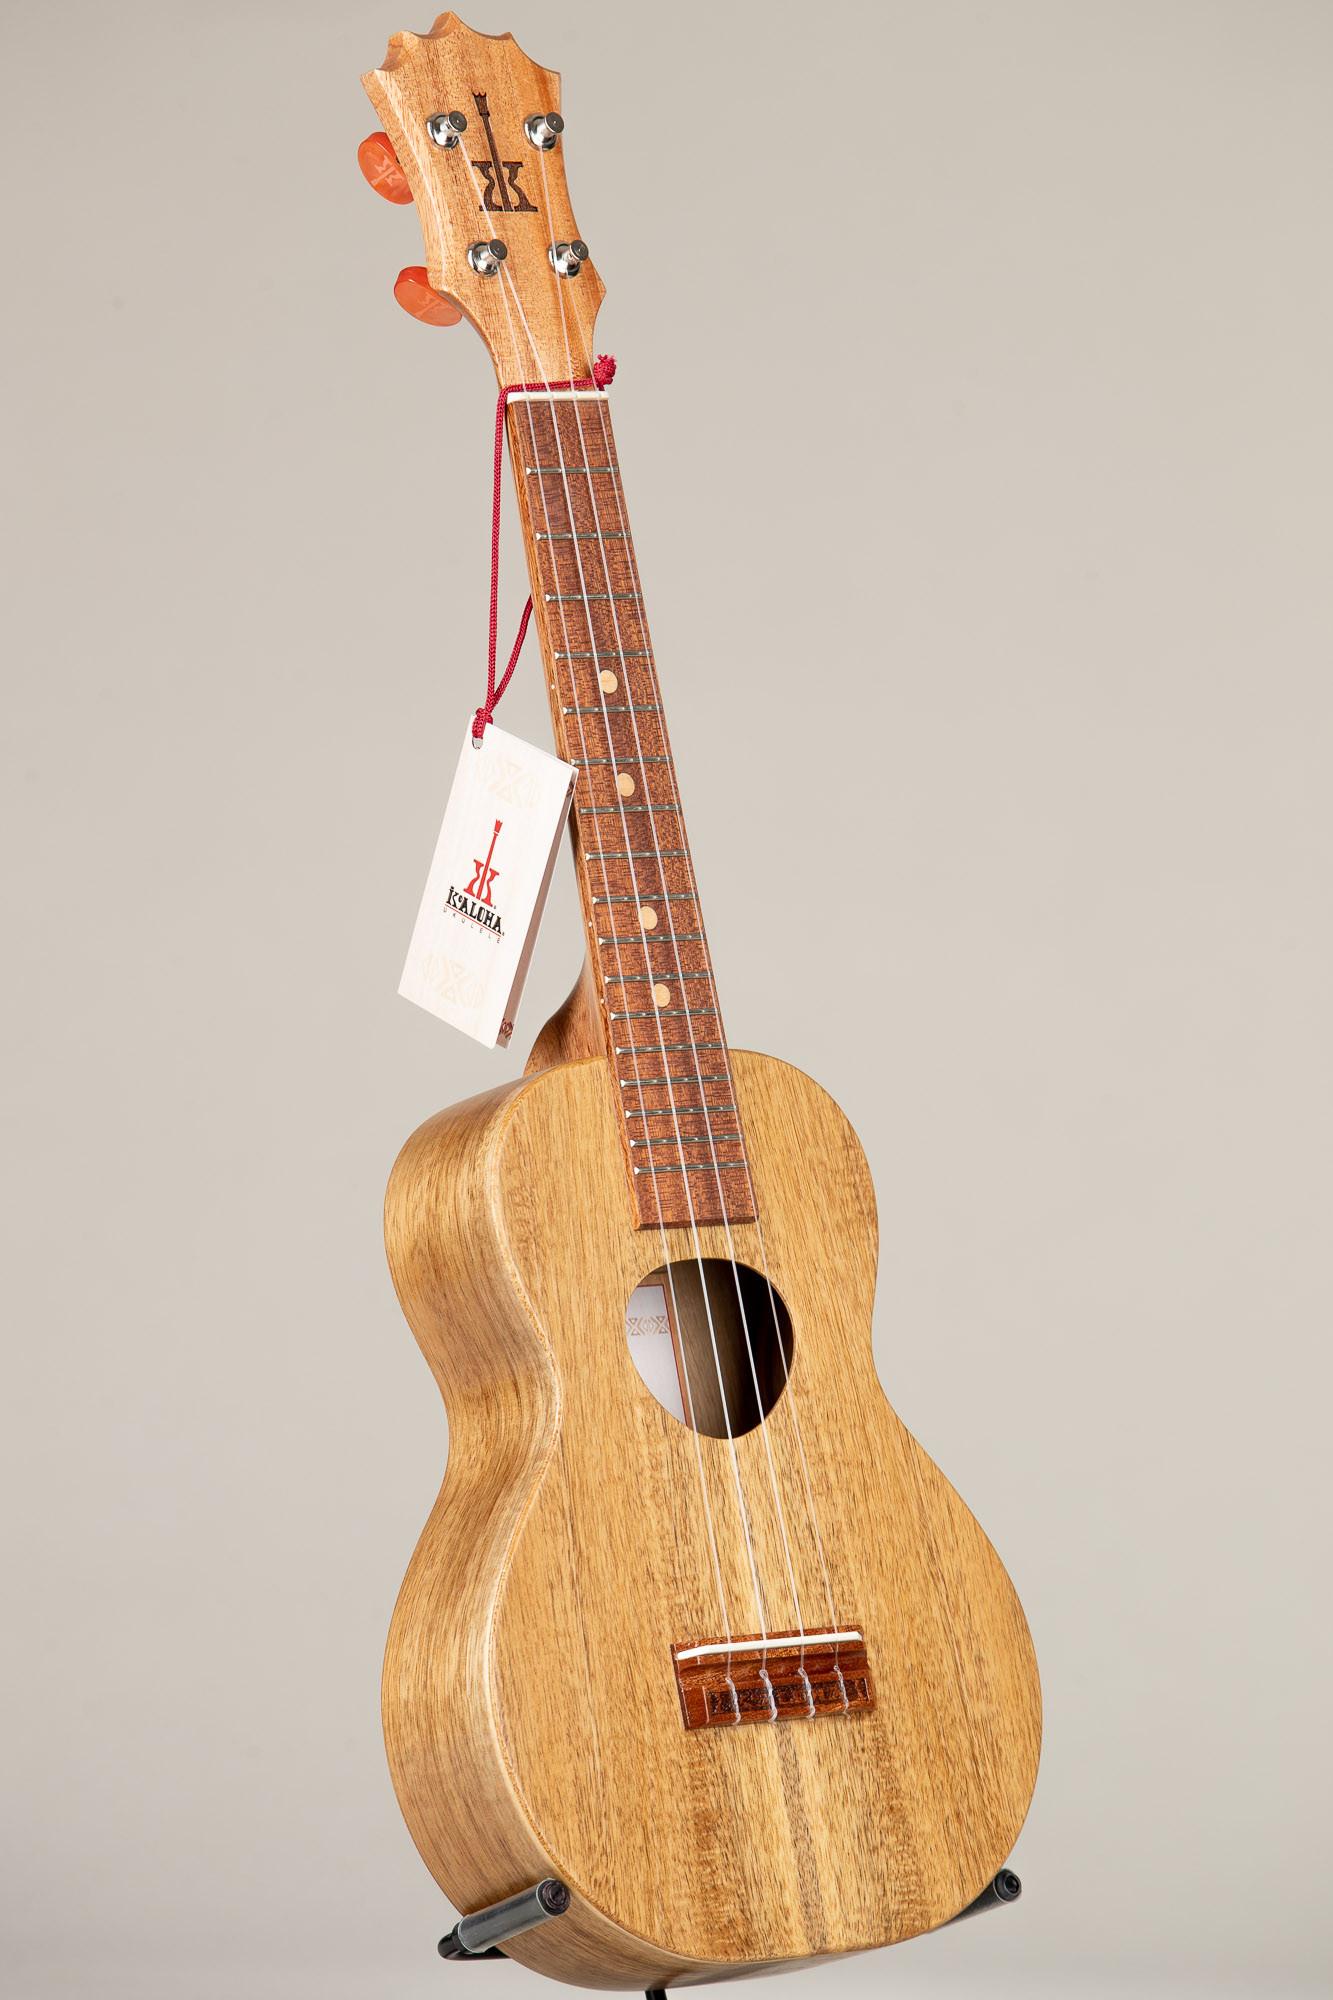 Koaloha Concert Acacia Ukulele (KCO-10 Select from Available)